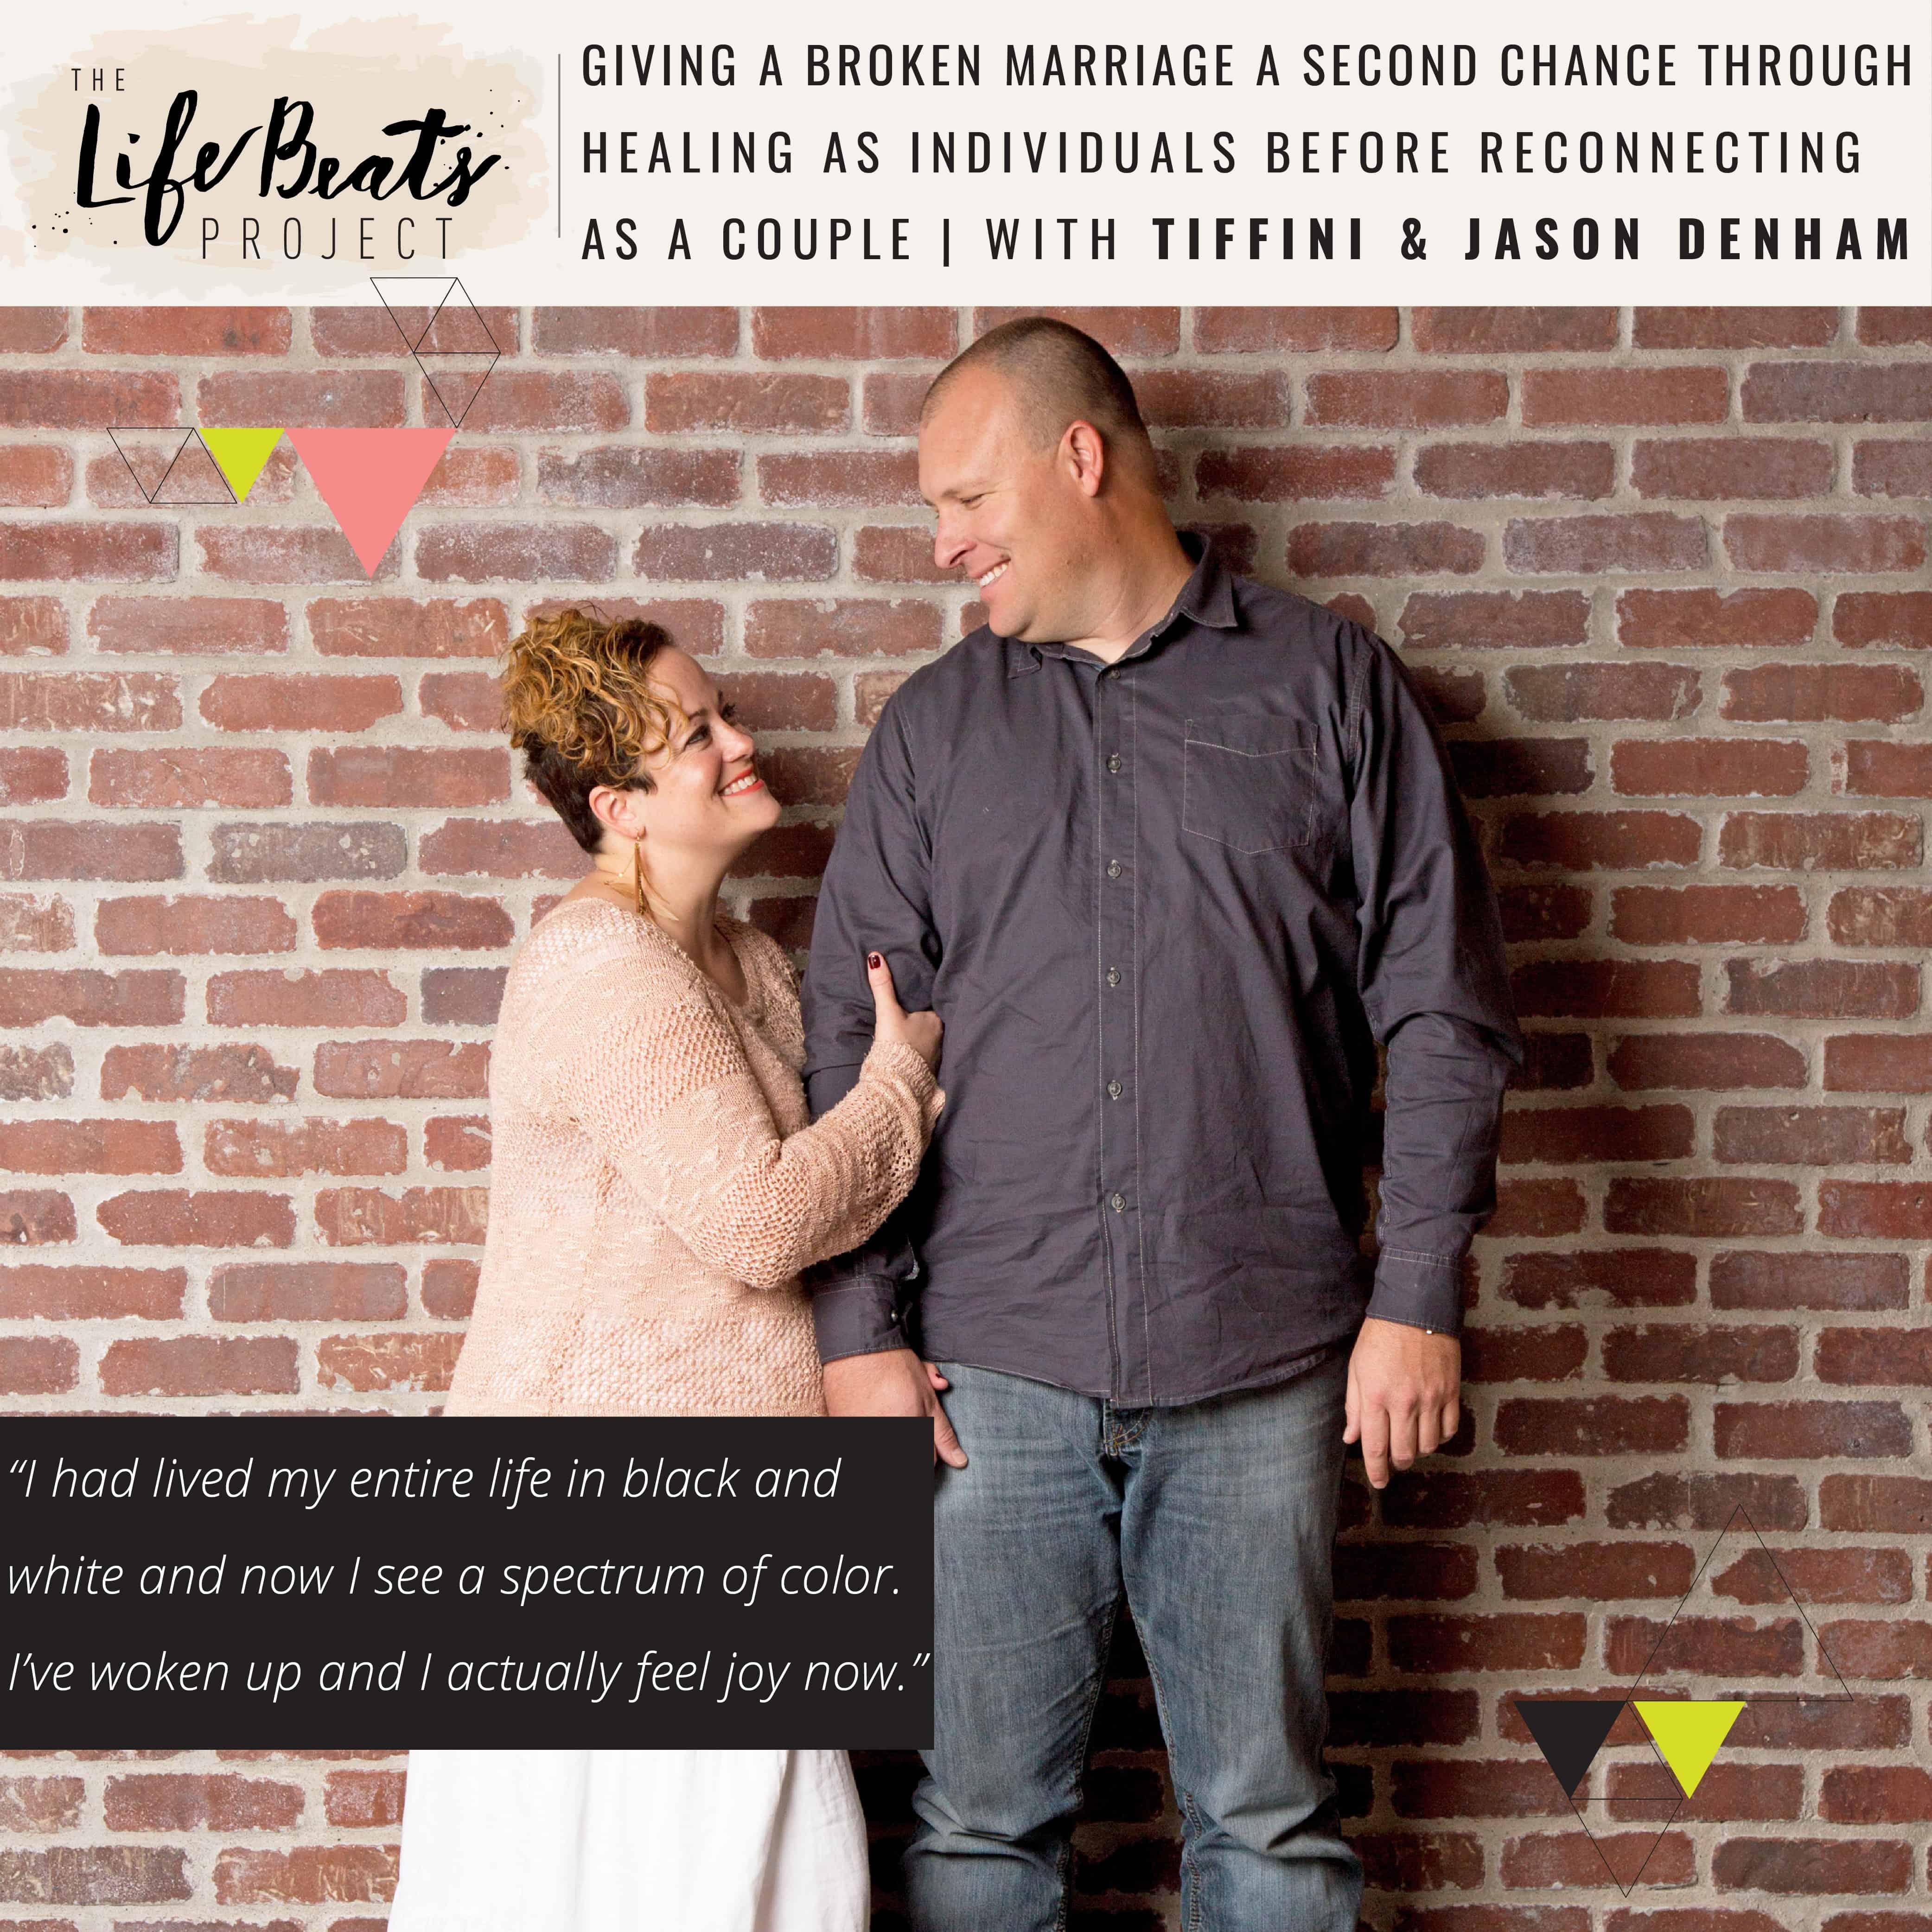 Giving a broken marriage a second chance through healing as